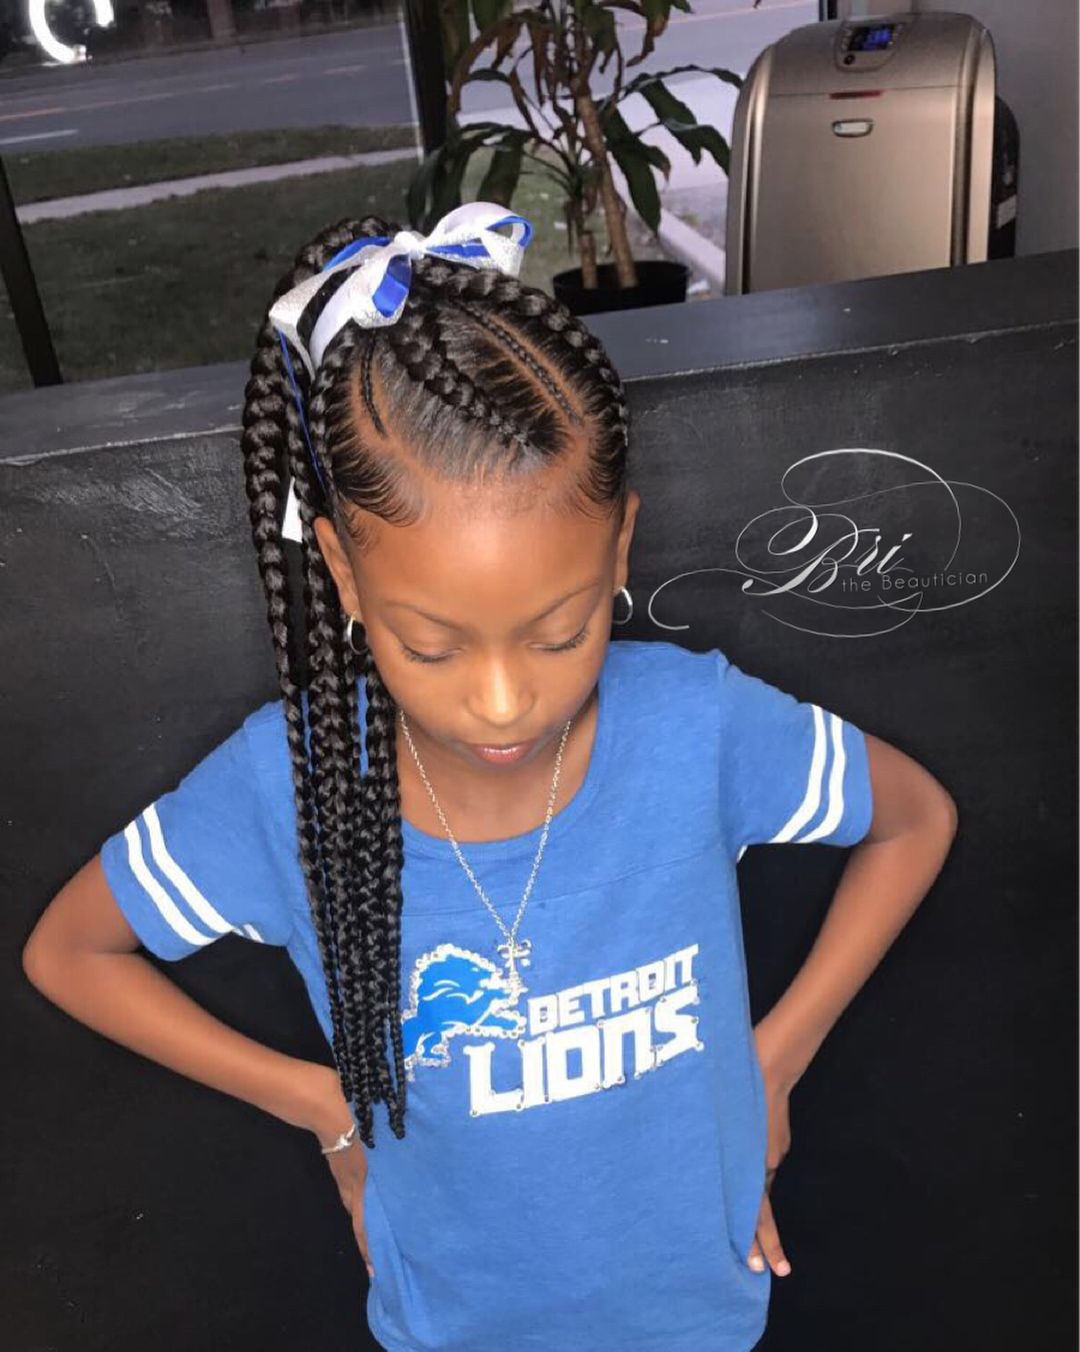 Only Ages 10 Feedinbraids Braidedponytail Girlyhairstyles Littlegirlhairstyles Littlegirlbraids Kids Hairstyles Girls Kids Hairstyles Lil Girl Hairstyles